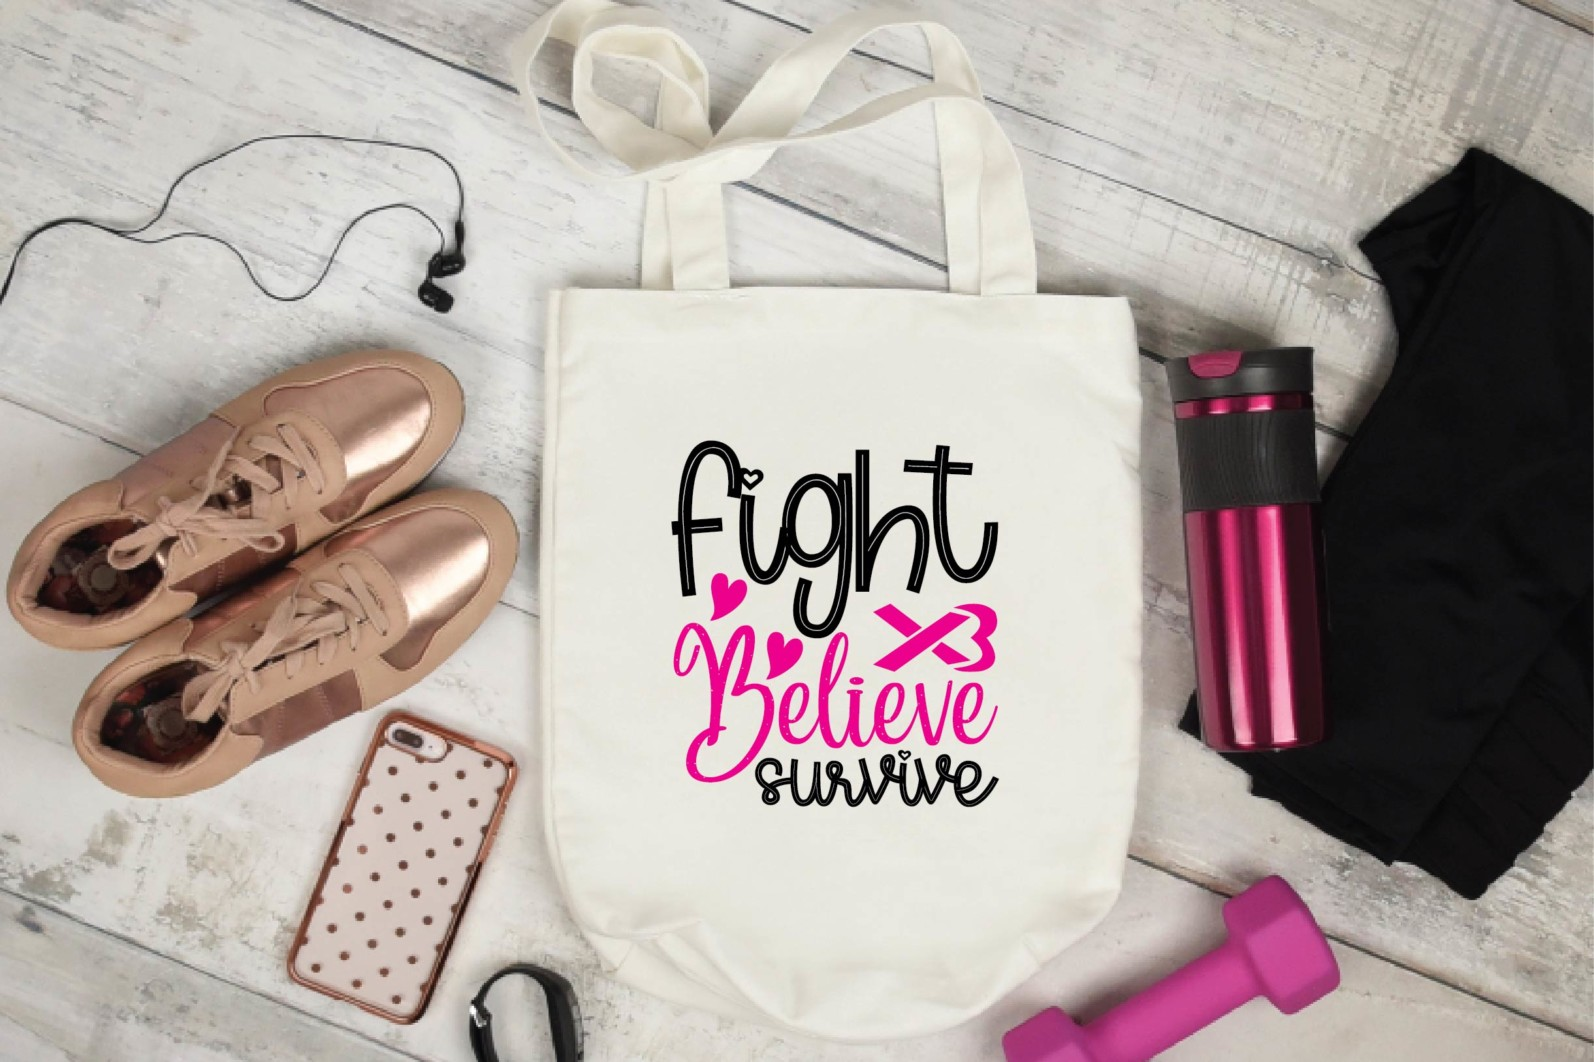 breast cancer svg vol- 4 - 5 01 4 -